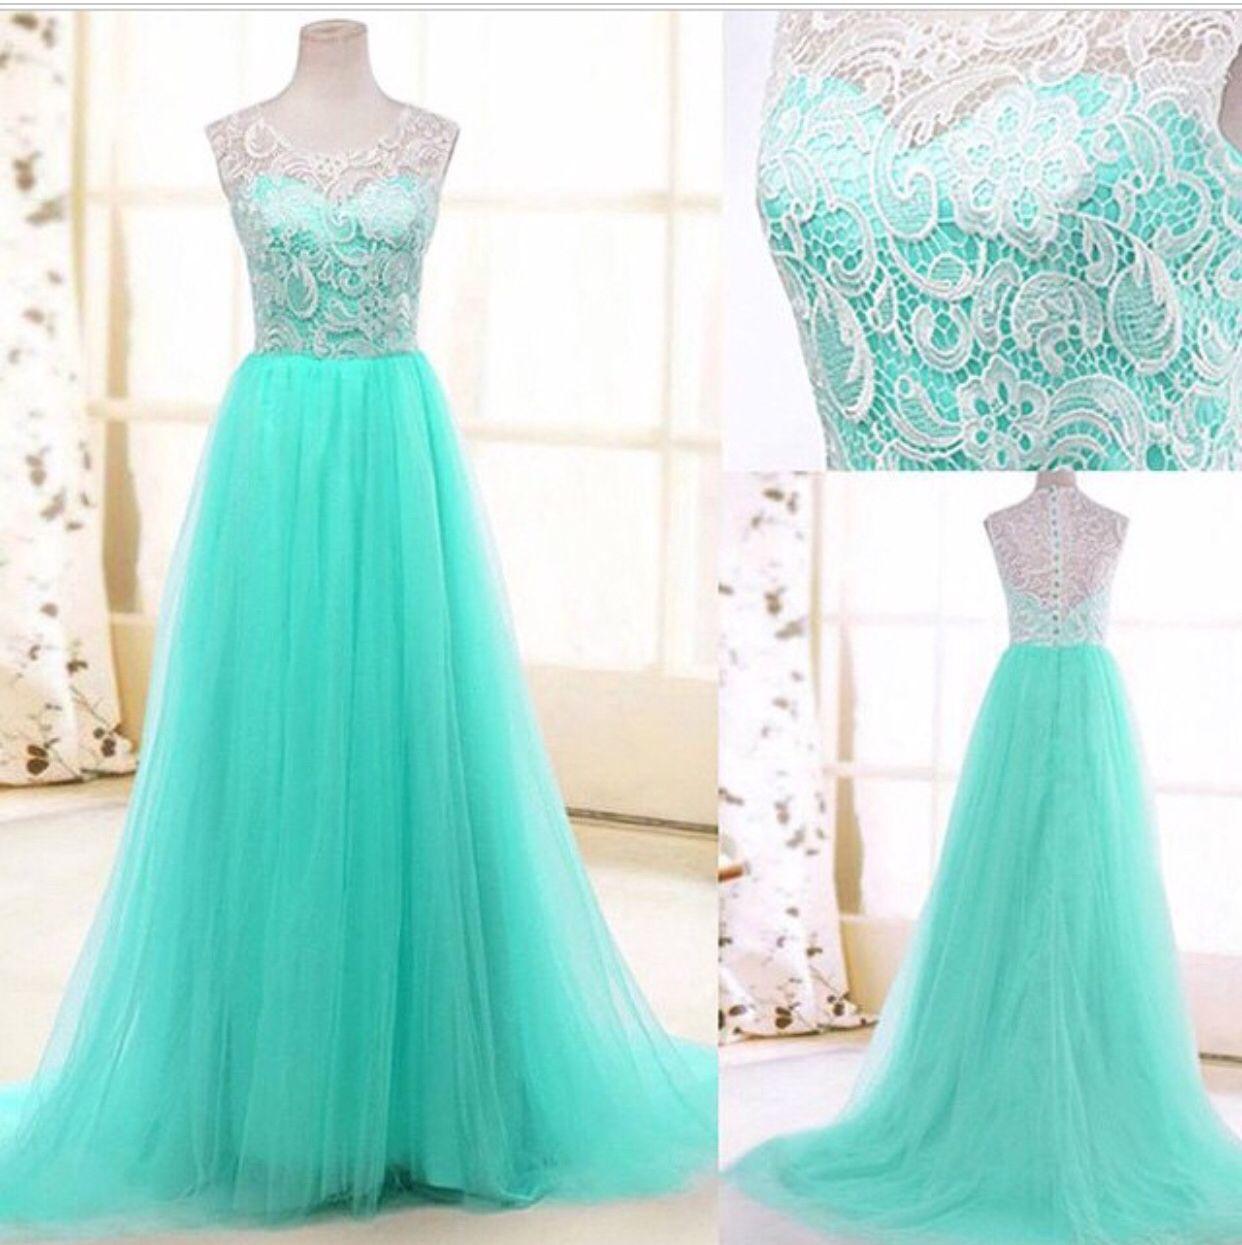 New Style Tulle Lace Long Prom Dress 2016 On Luulla Dress on Luulla ...